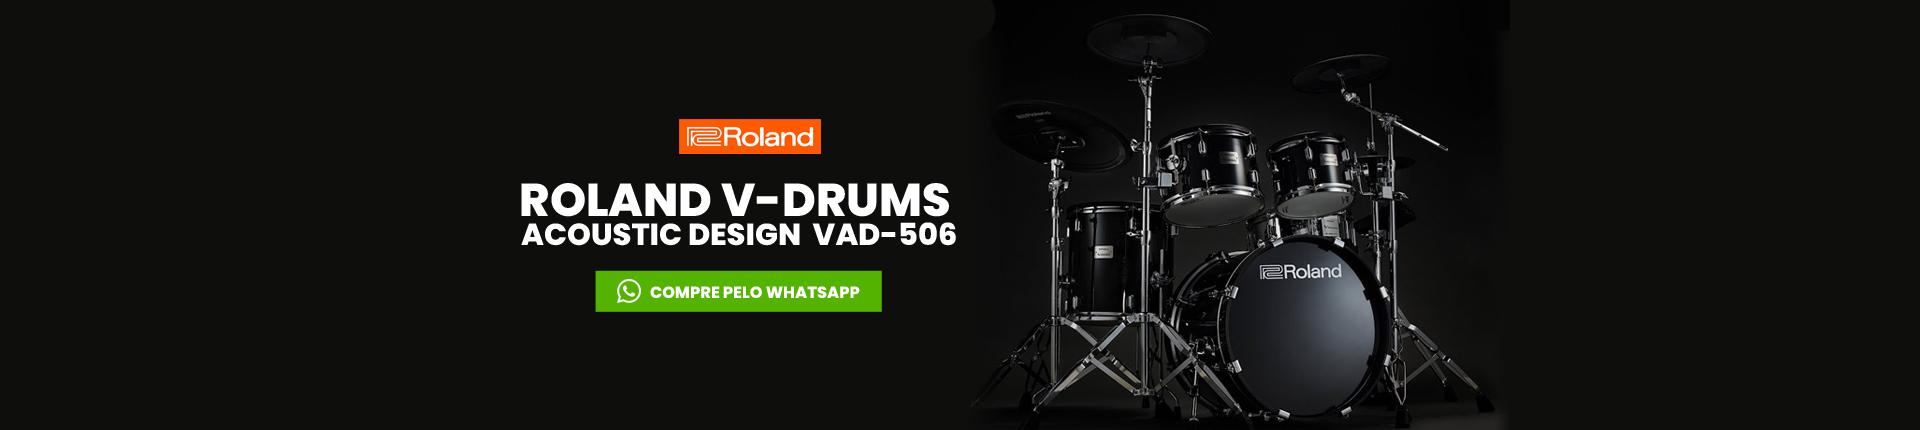 Roland VAD-506